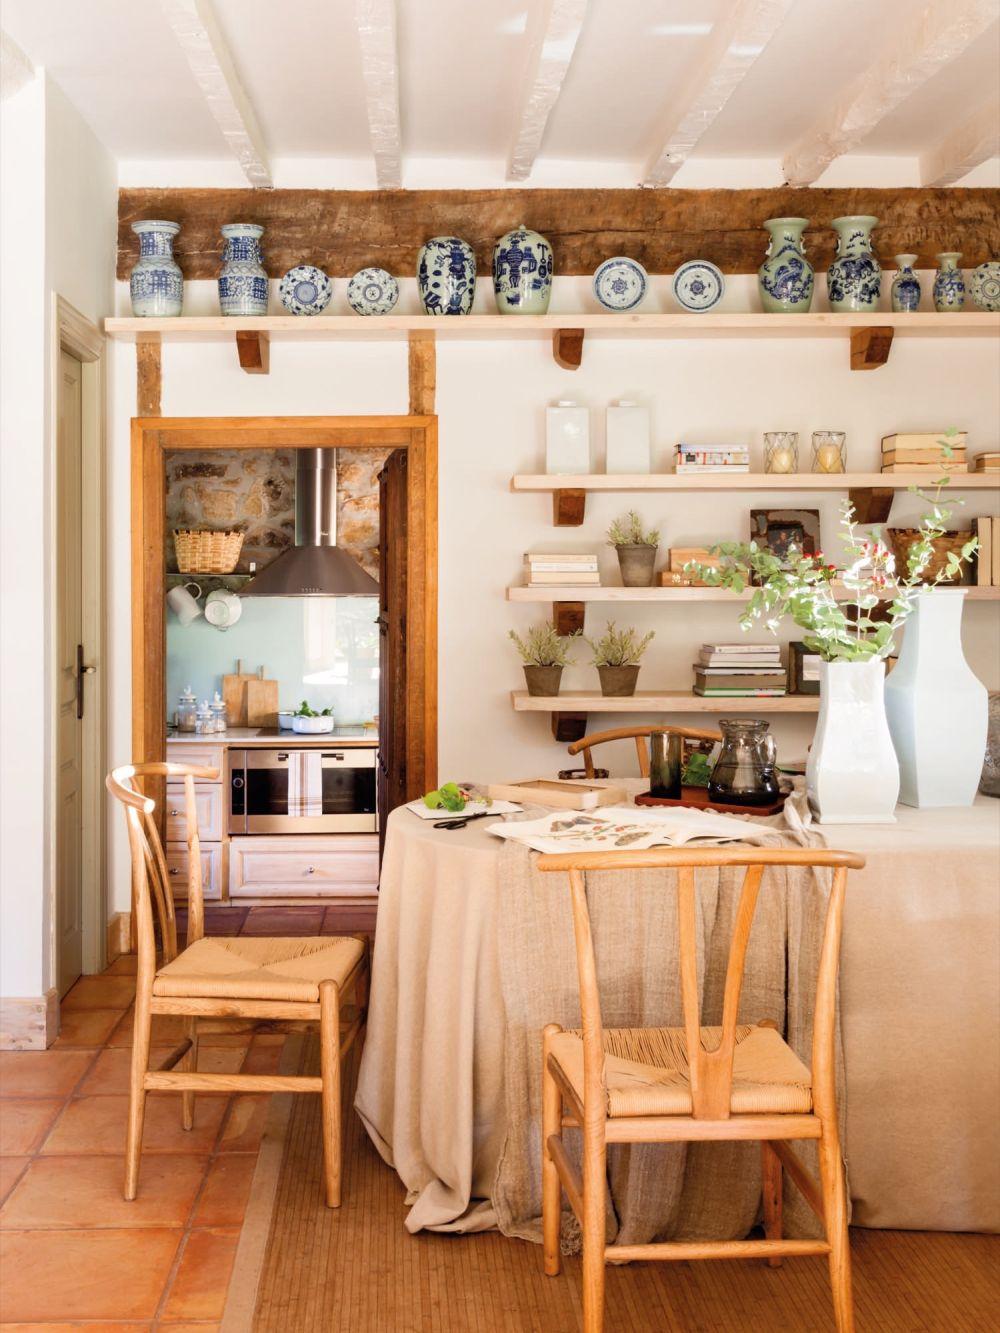 adelaparvu.com despre casa rustica renovata, Spania, Foto Felipe Scheffel, ElMueble (7)